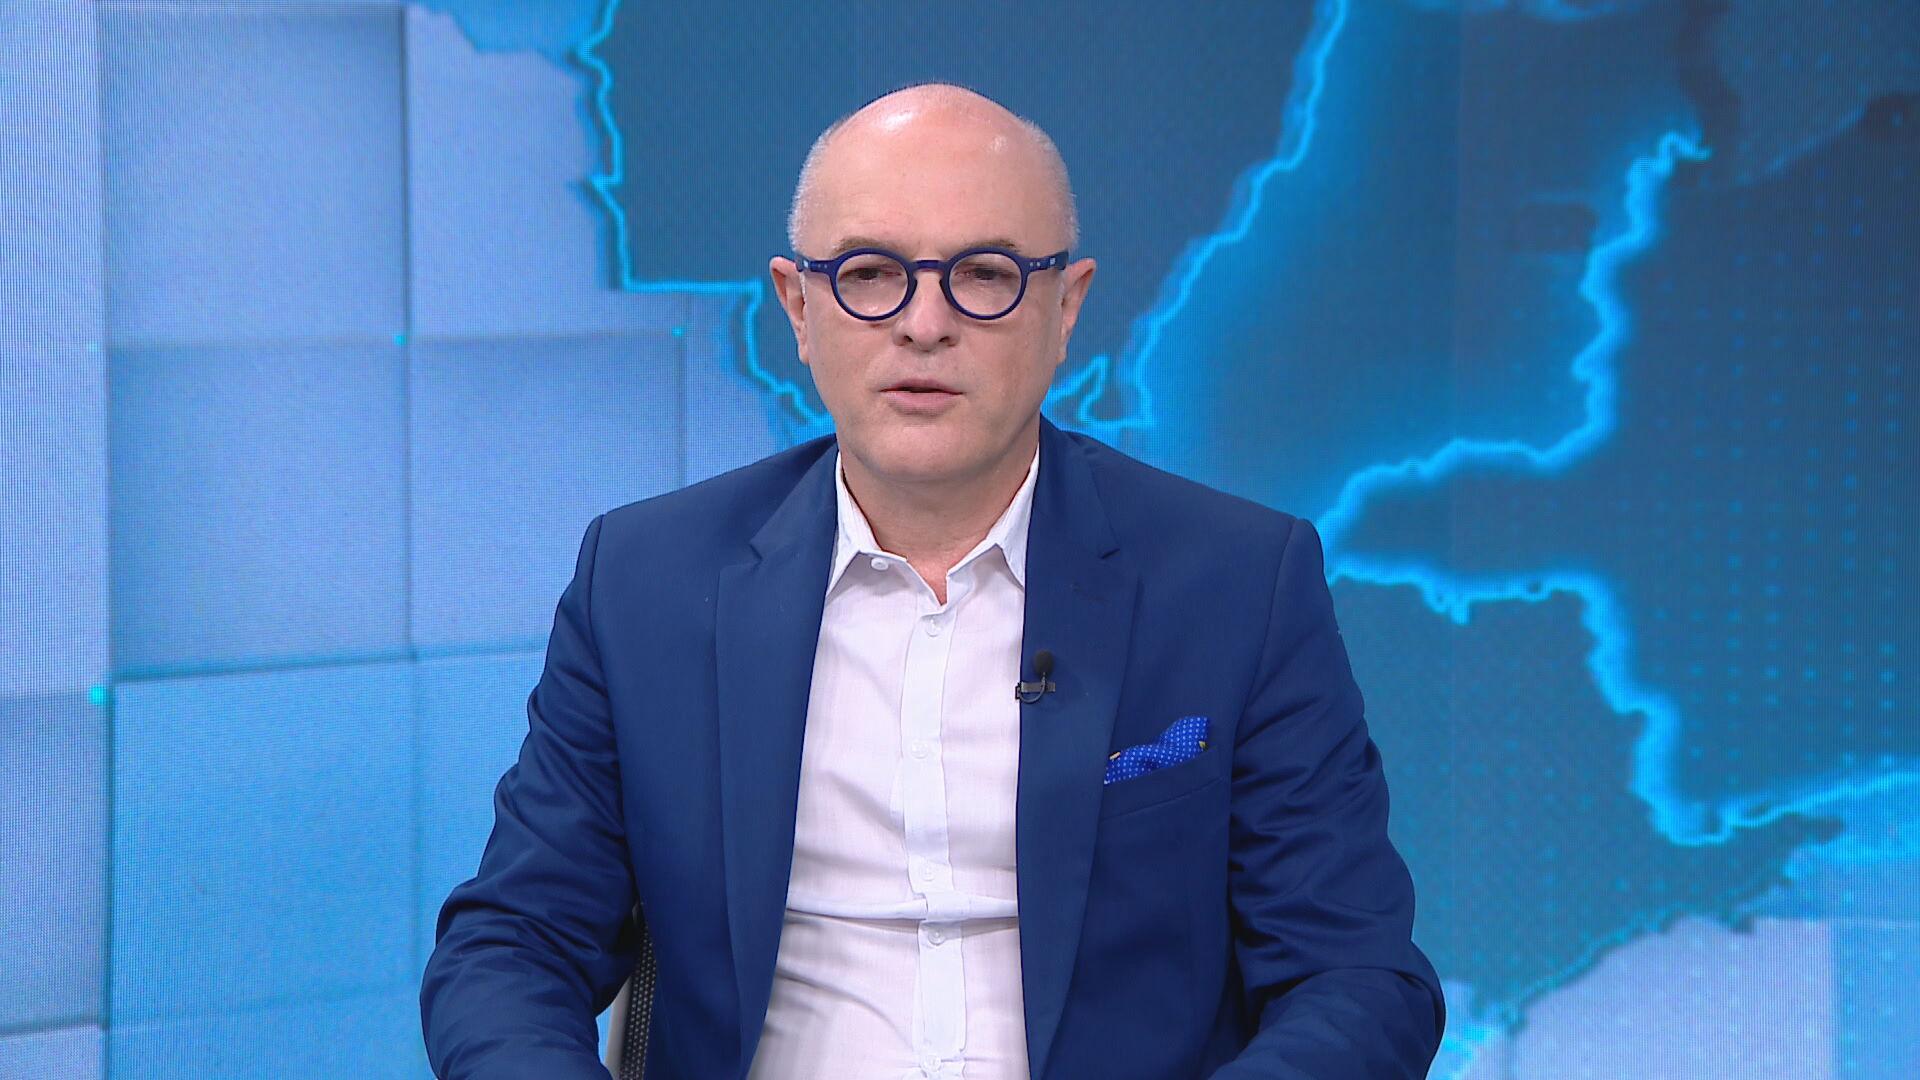 Dirceu Barbano, ex-presidente da Anvisa